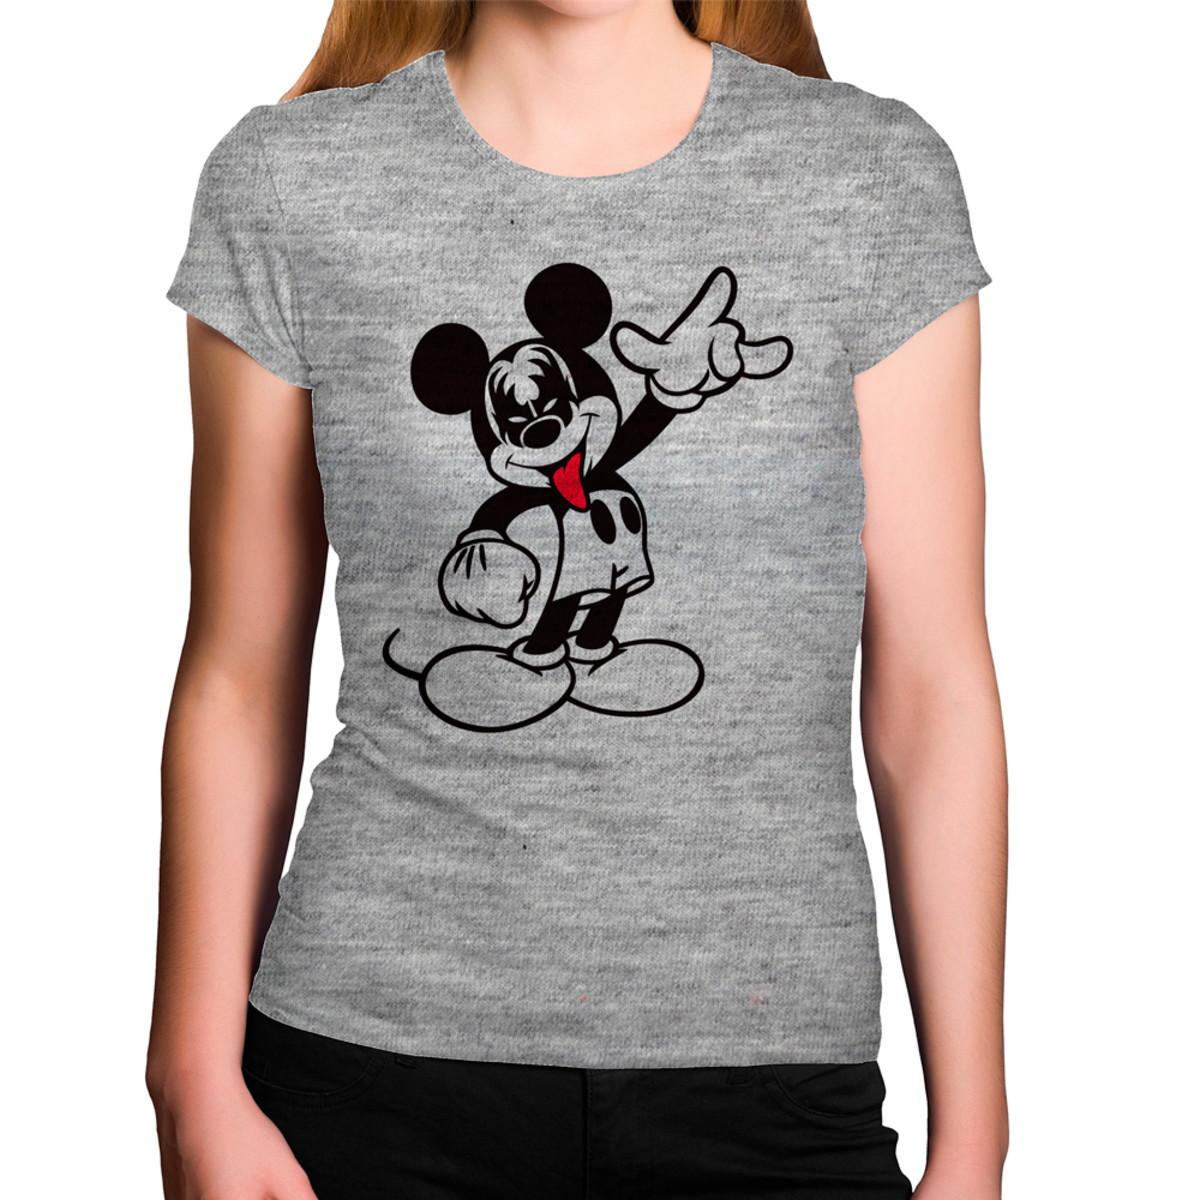 f015576c1 Camiseta Feminina Cinza Mescla Mickey Kiss Banda de Rock Pes no Elo7 ...